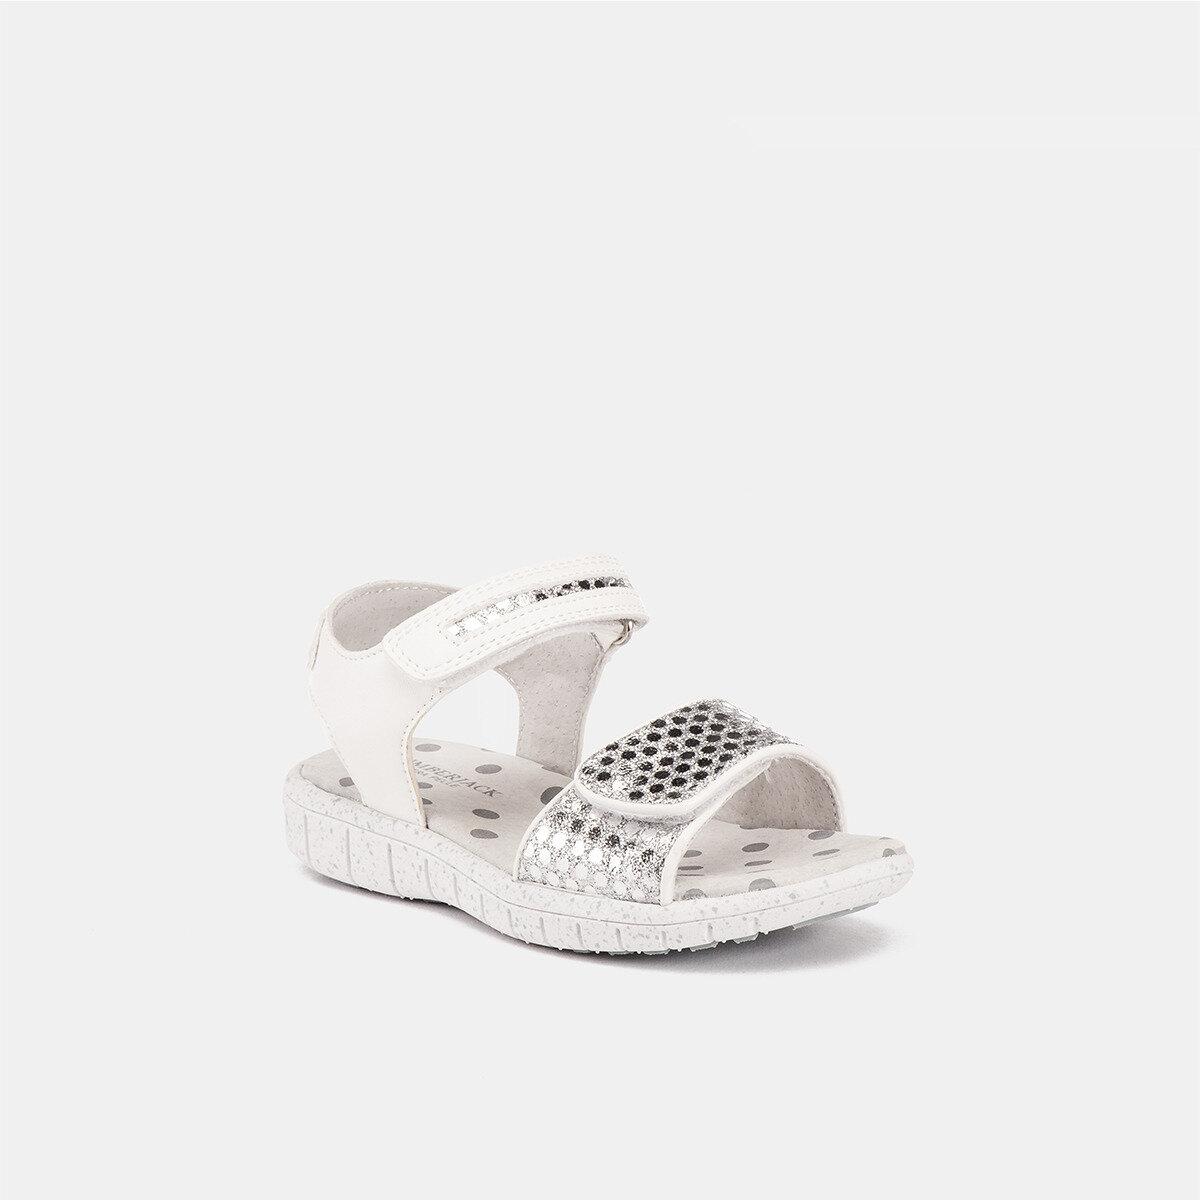 SPONGY WHITE/SILVER Girl Sandals